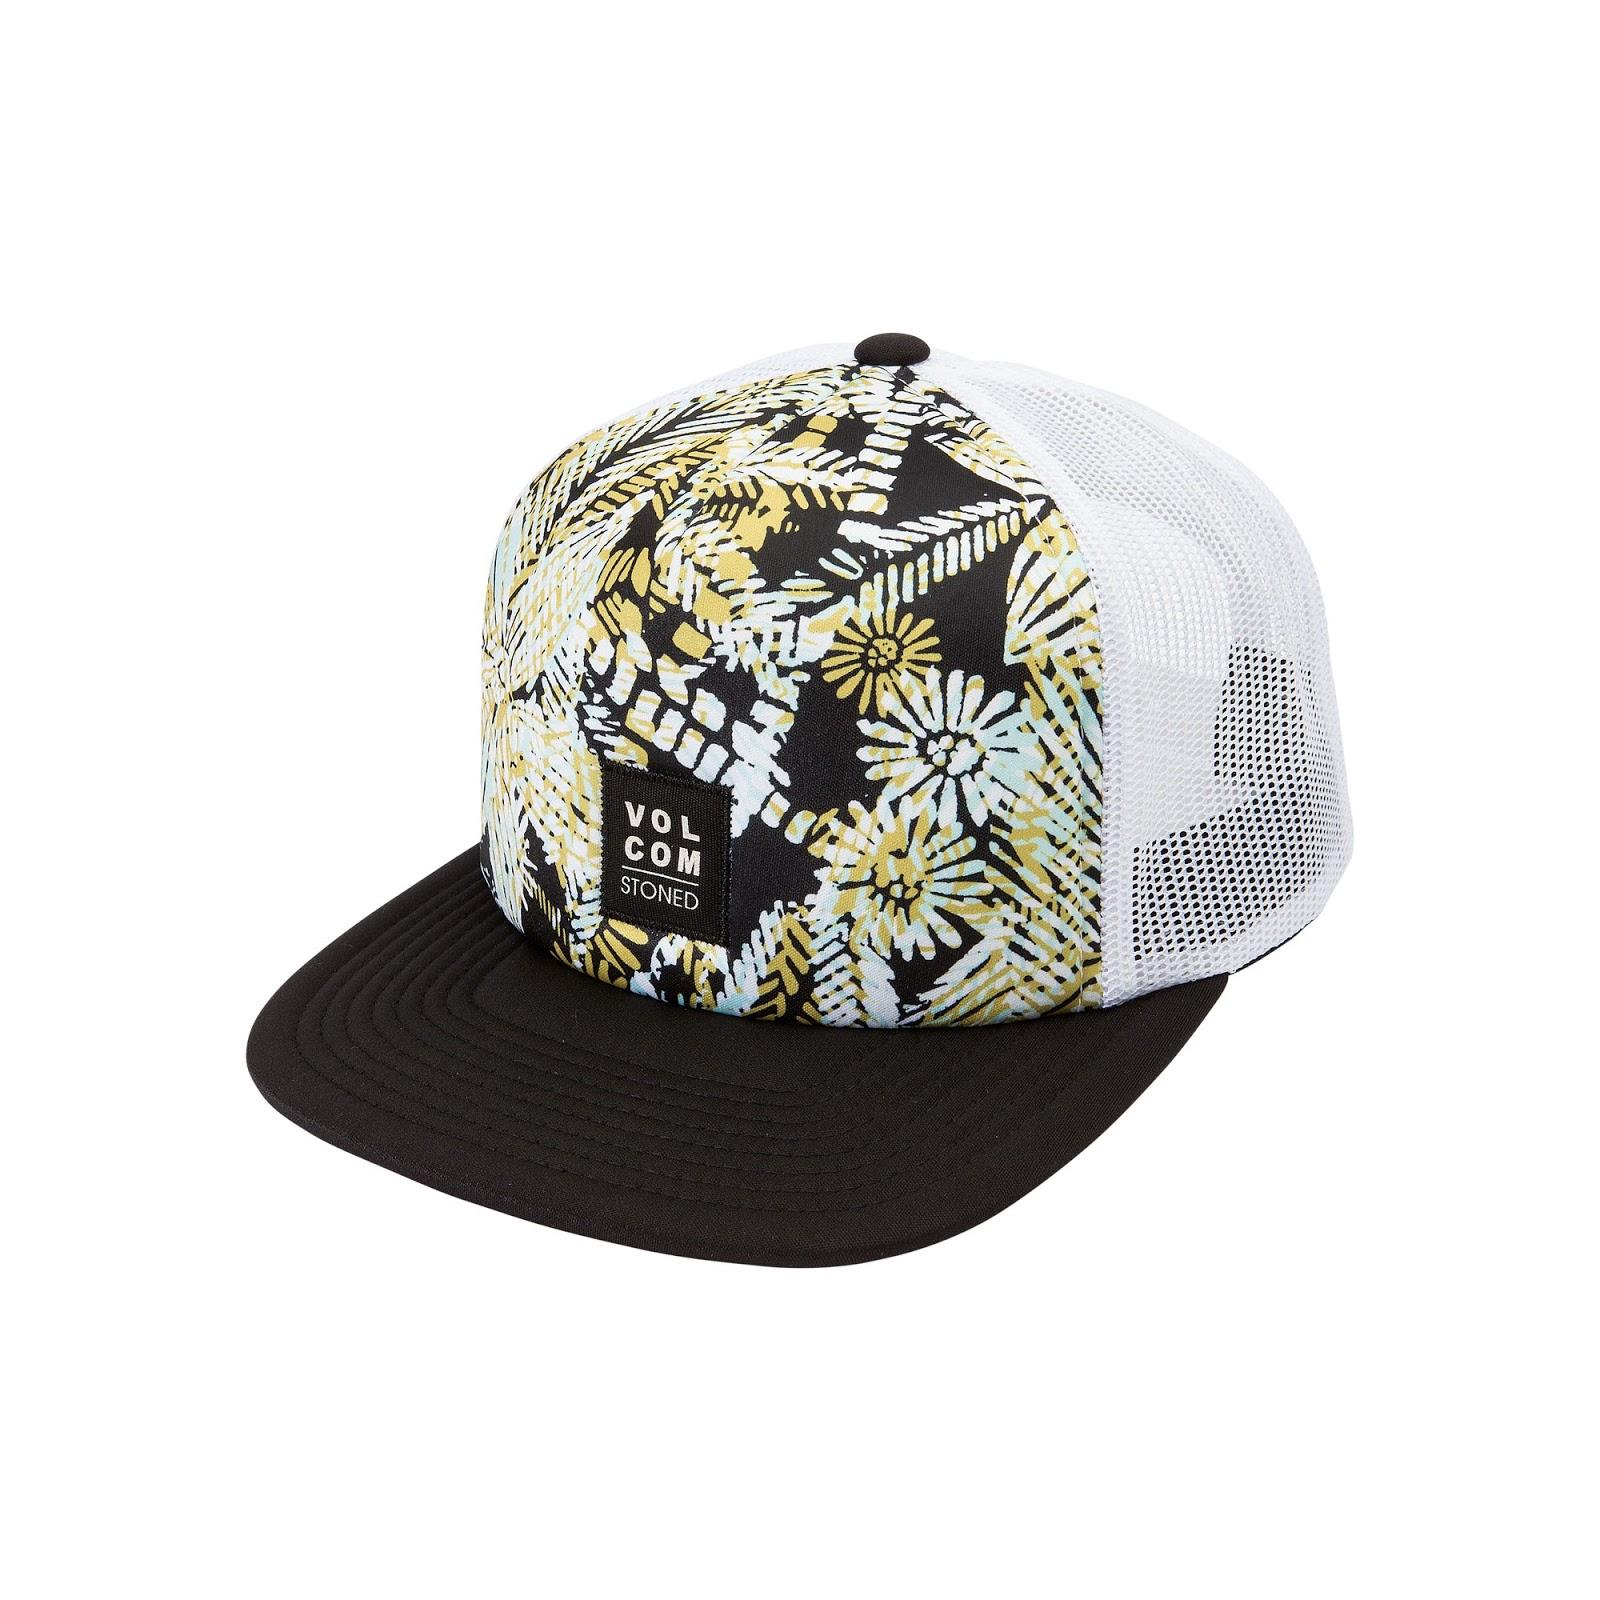 Topi Yang Lagi Trend Sekarang godean.web.id